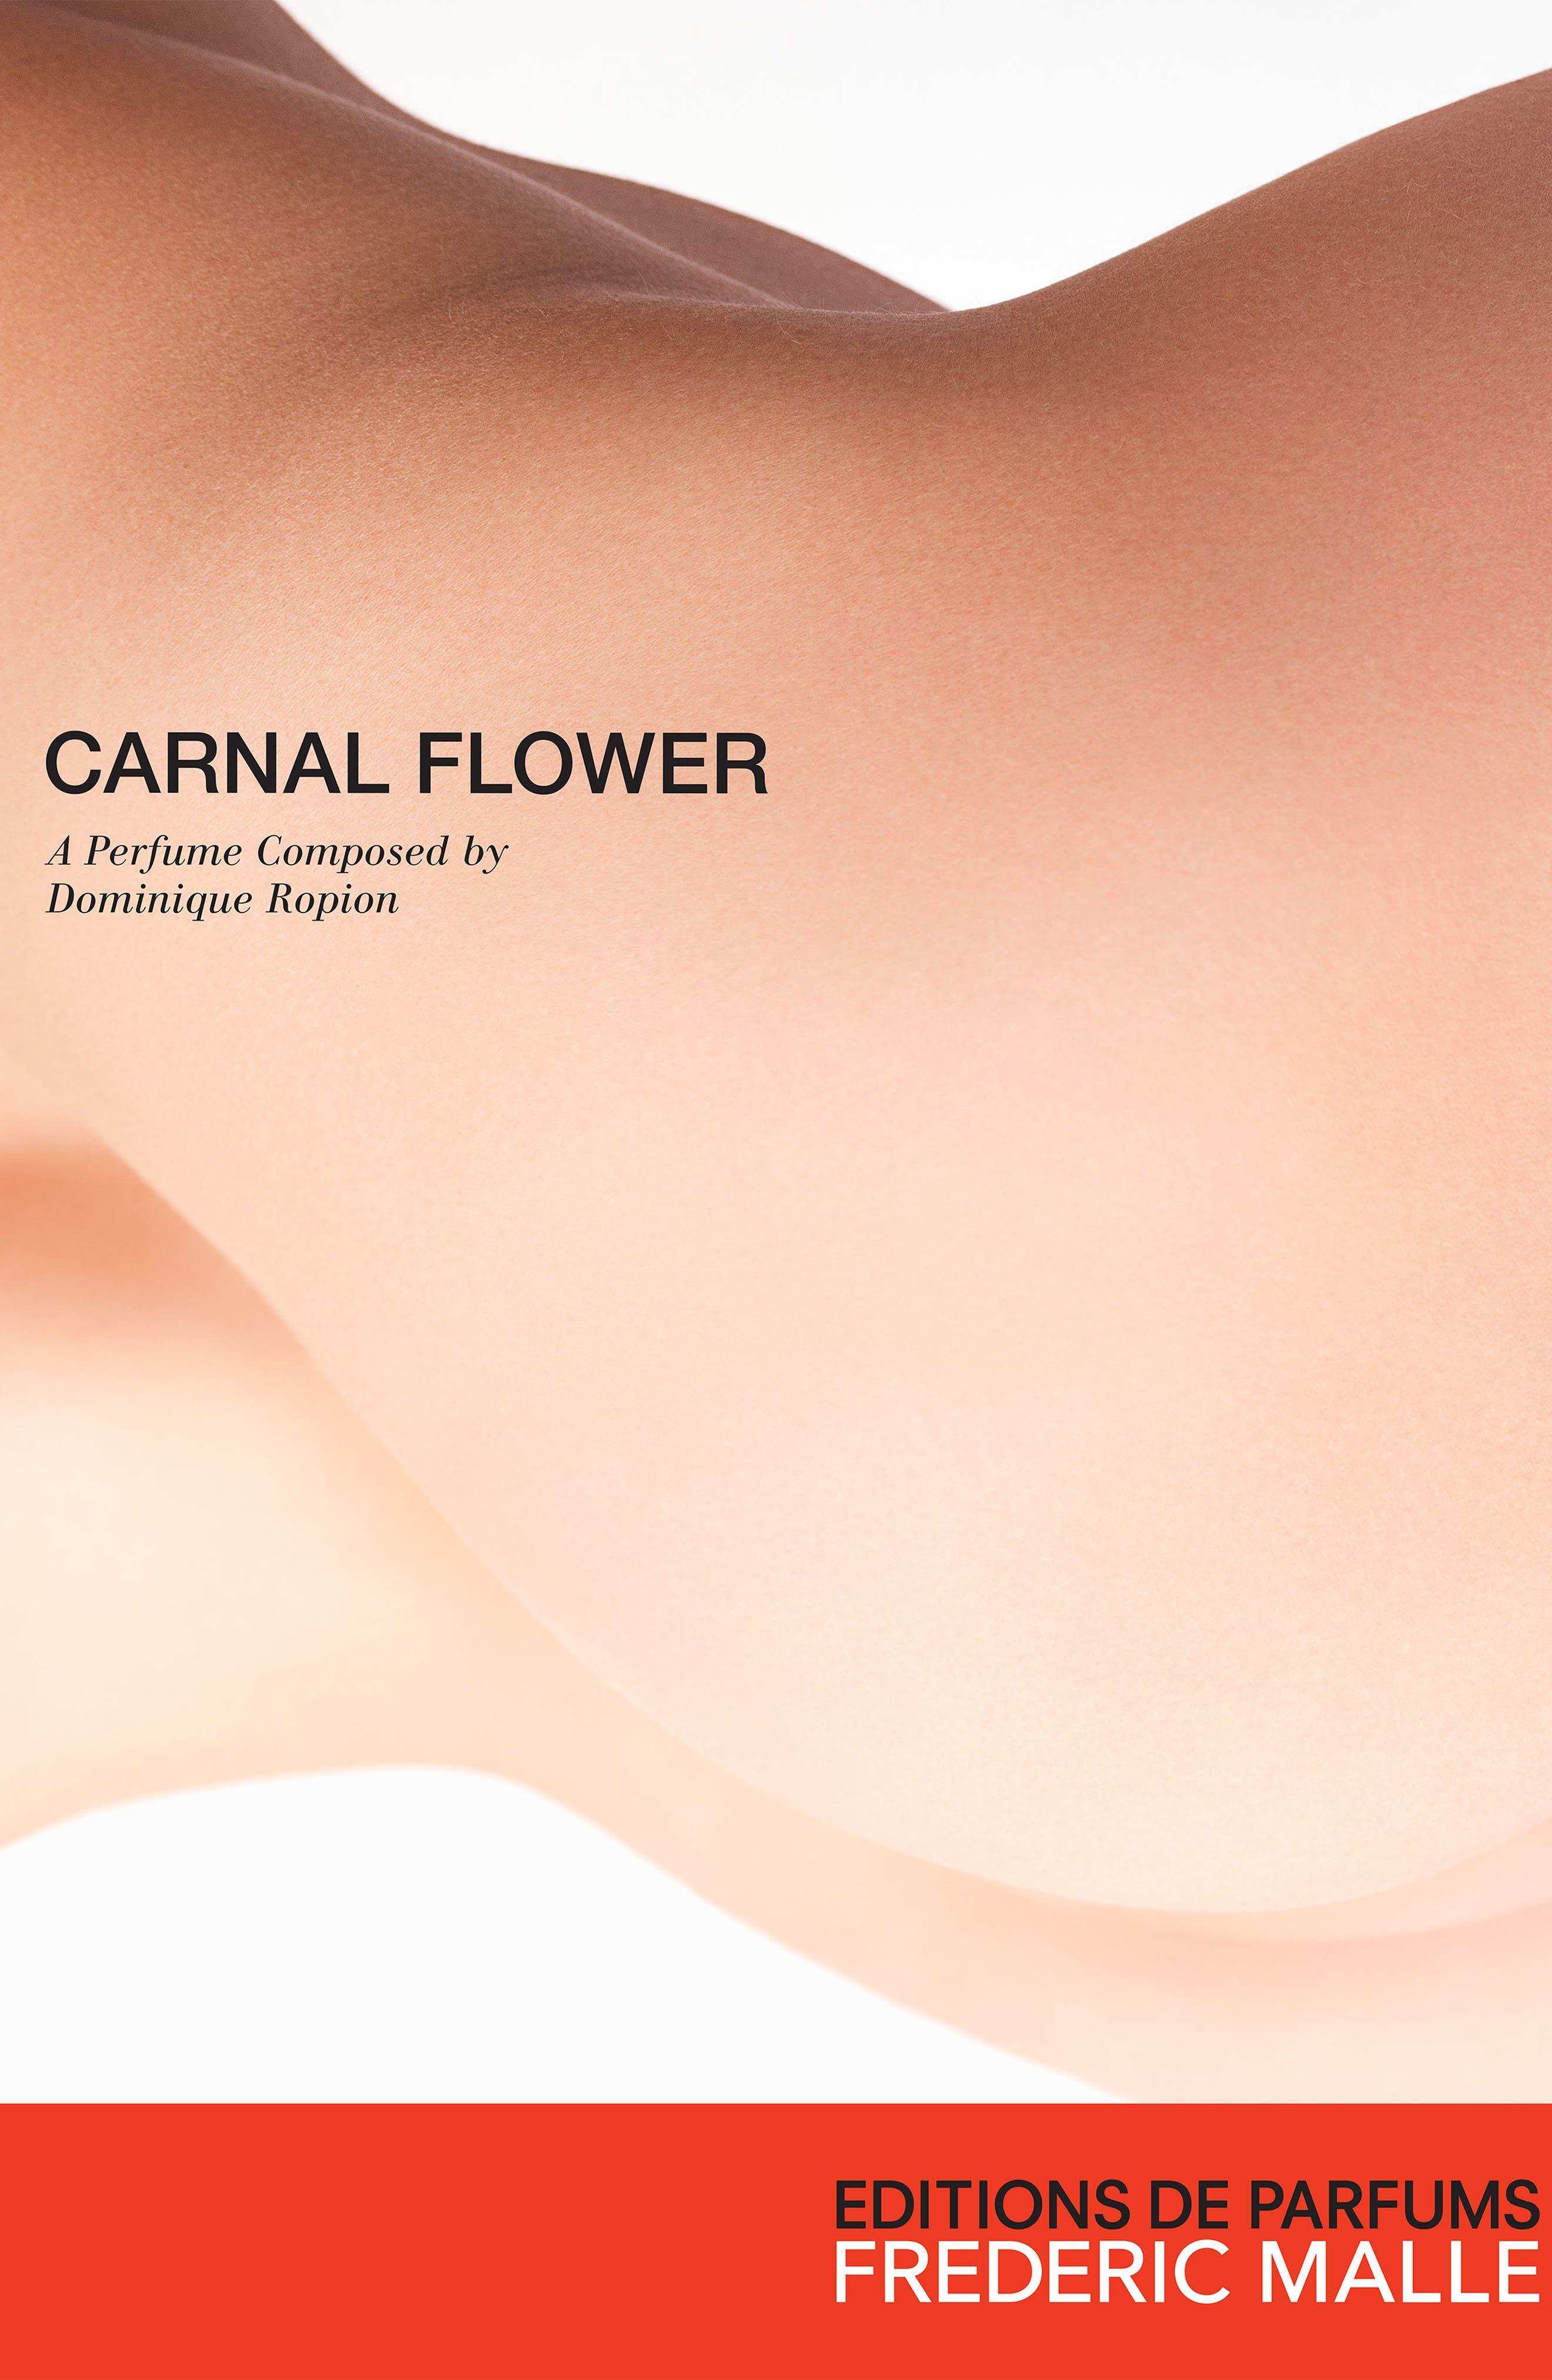 Alternate Image 3  - Editions de Parfums Frédéric Malle Carnal Flower Body Butter